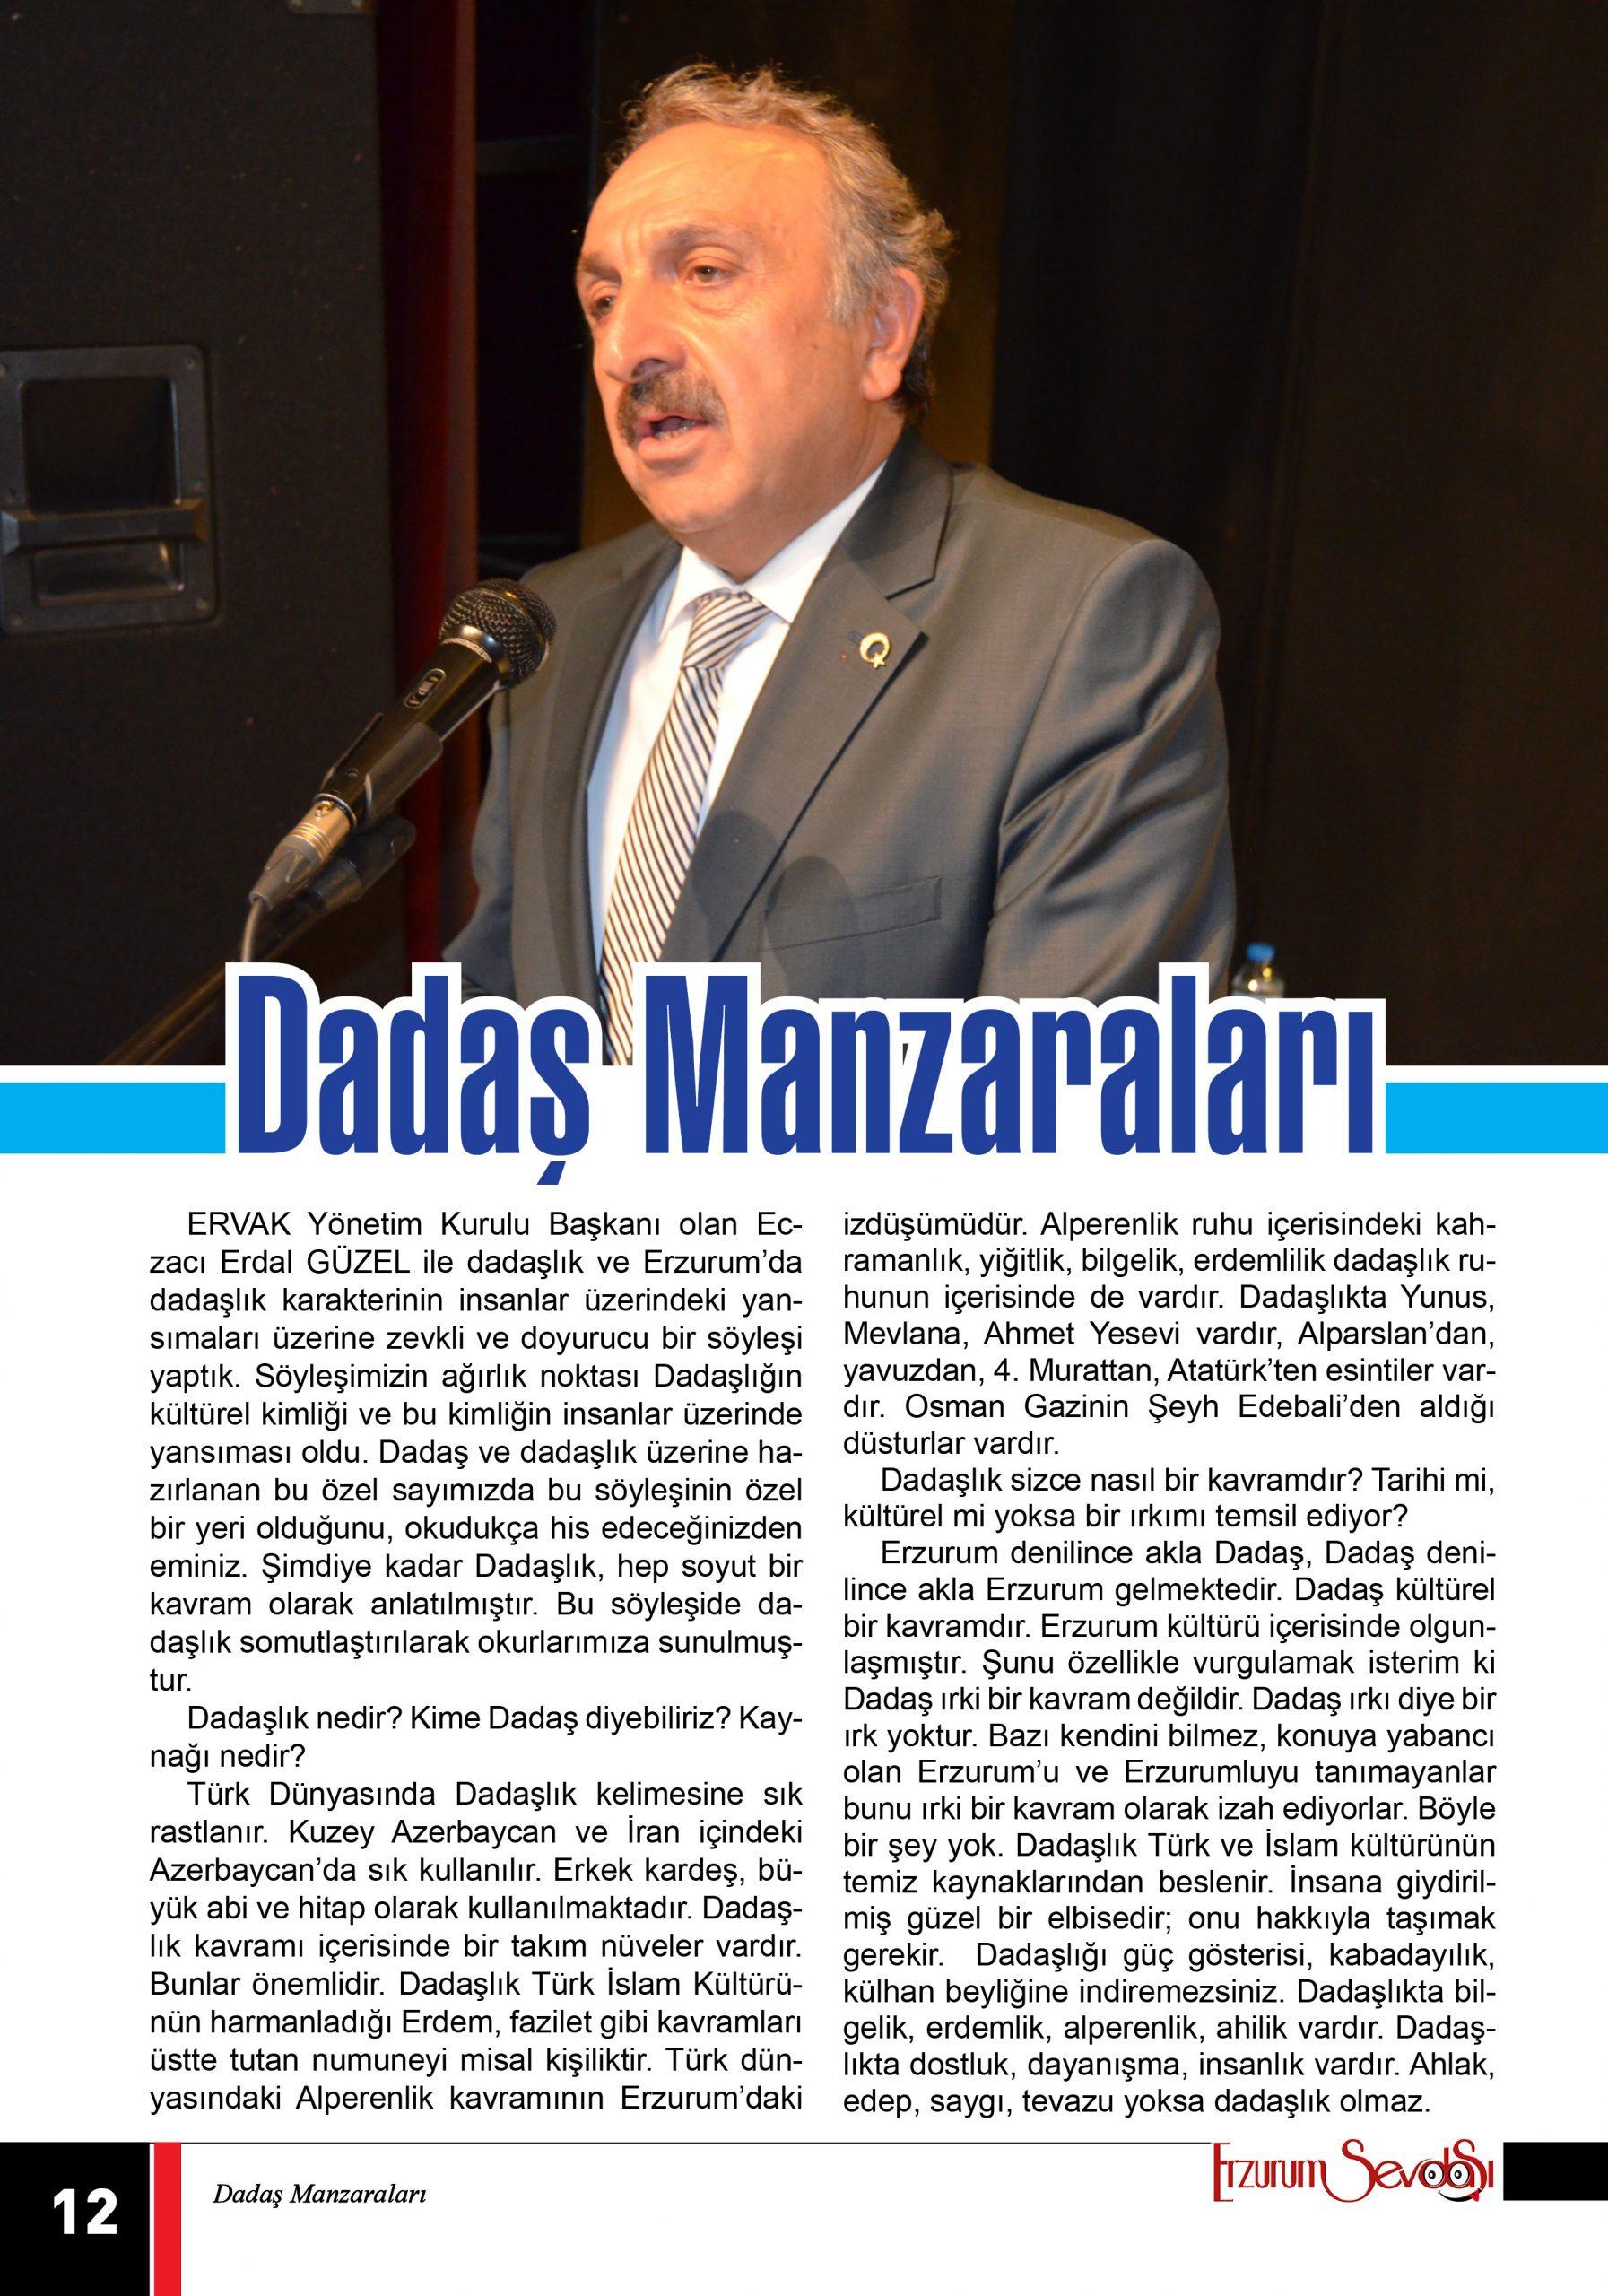 DADAŞ MANZARALARI